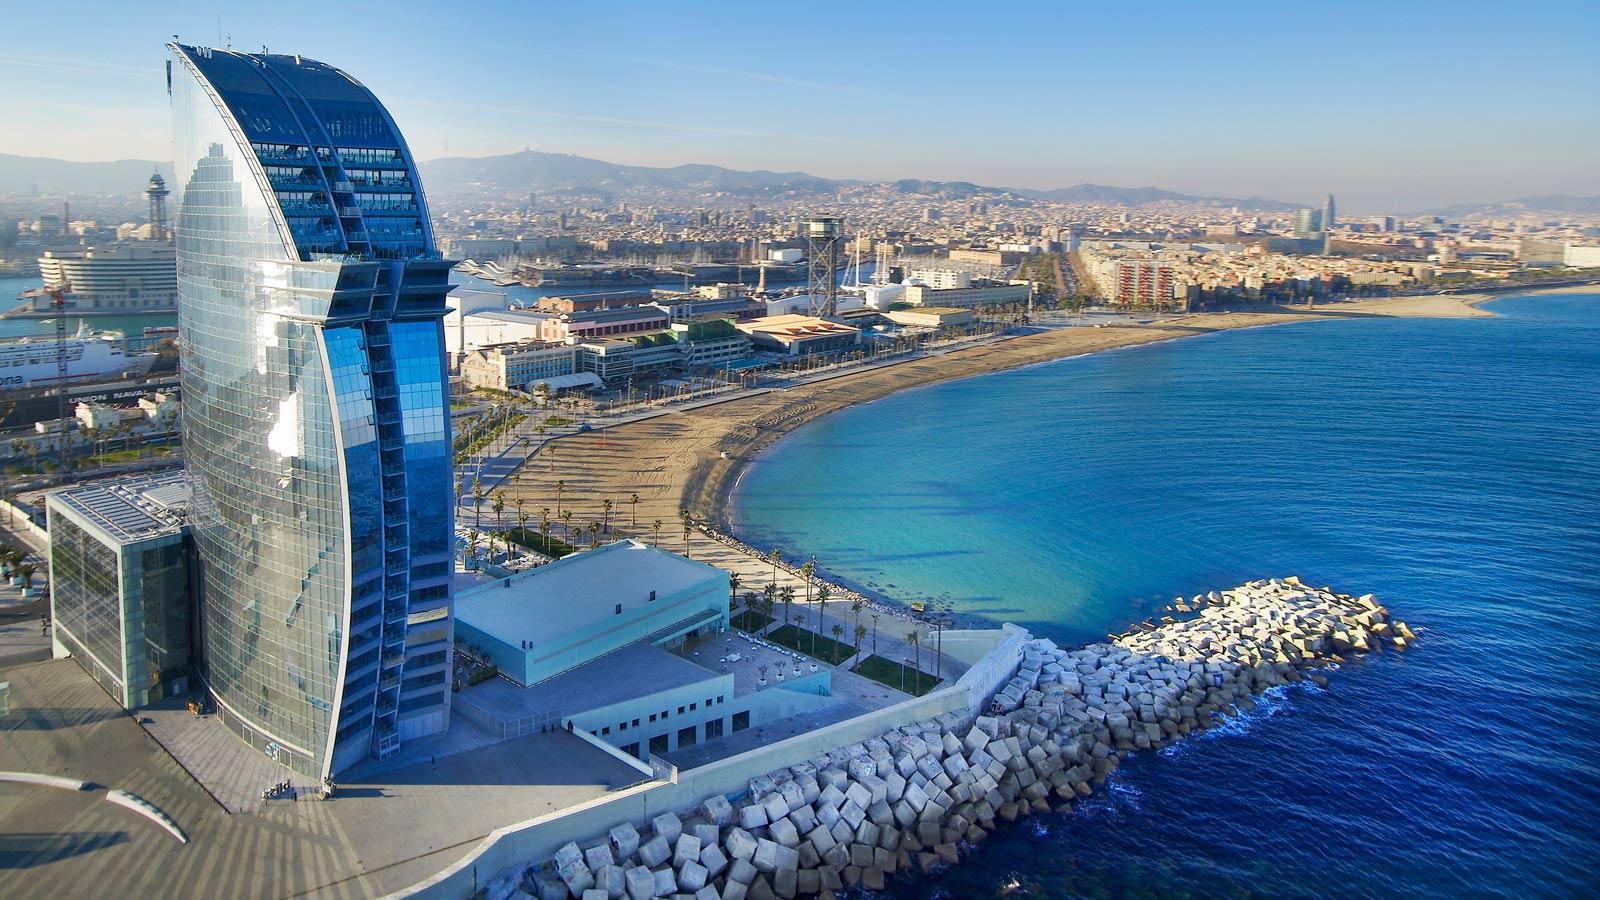 LGBT travel guide Barcelona - W Hotel